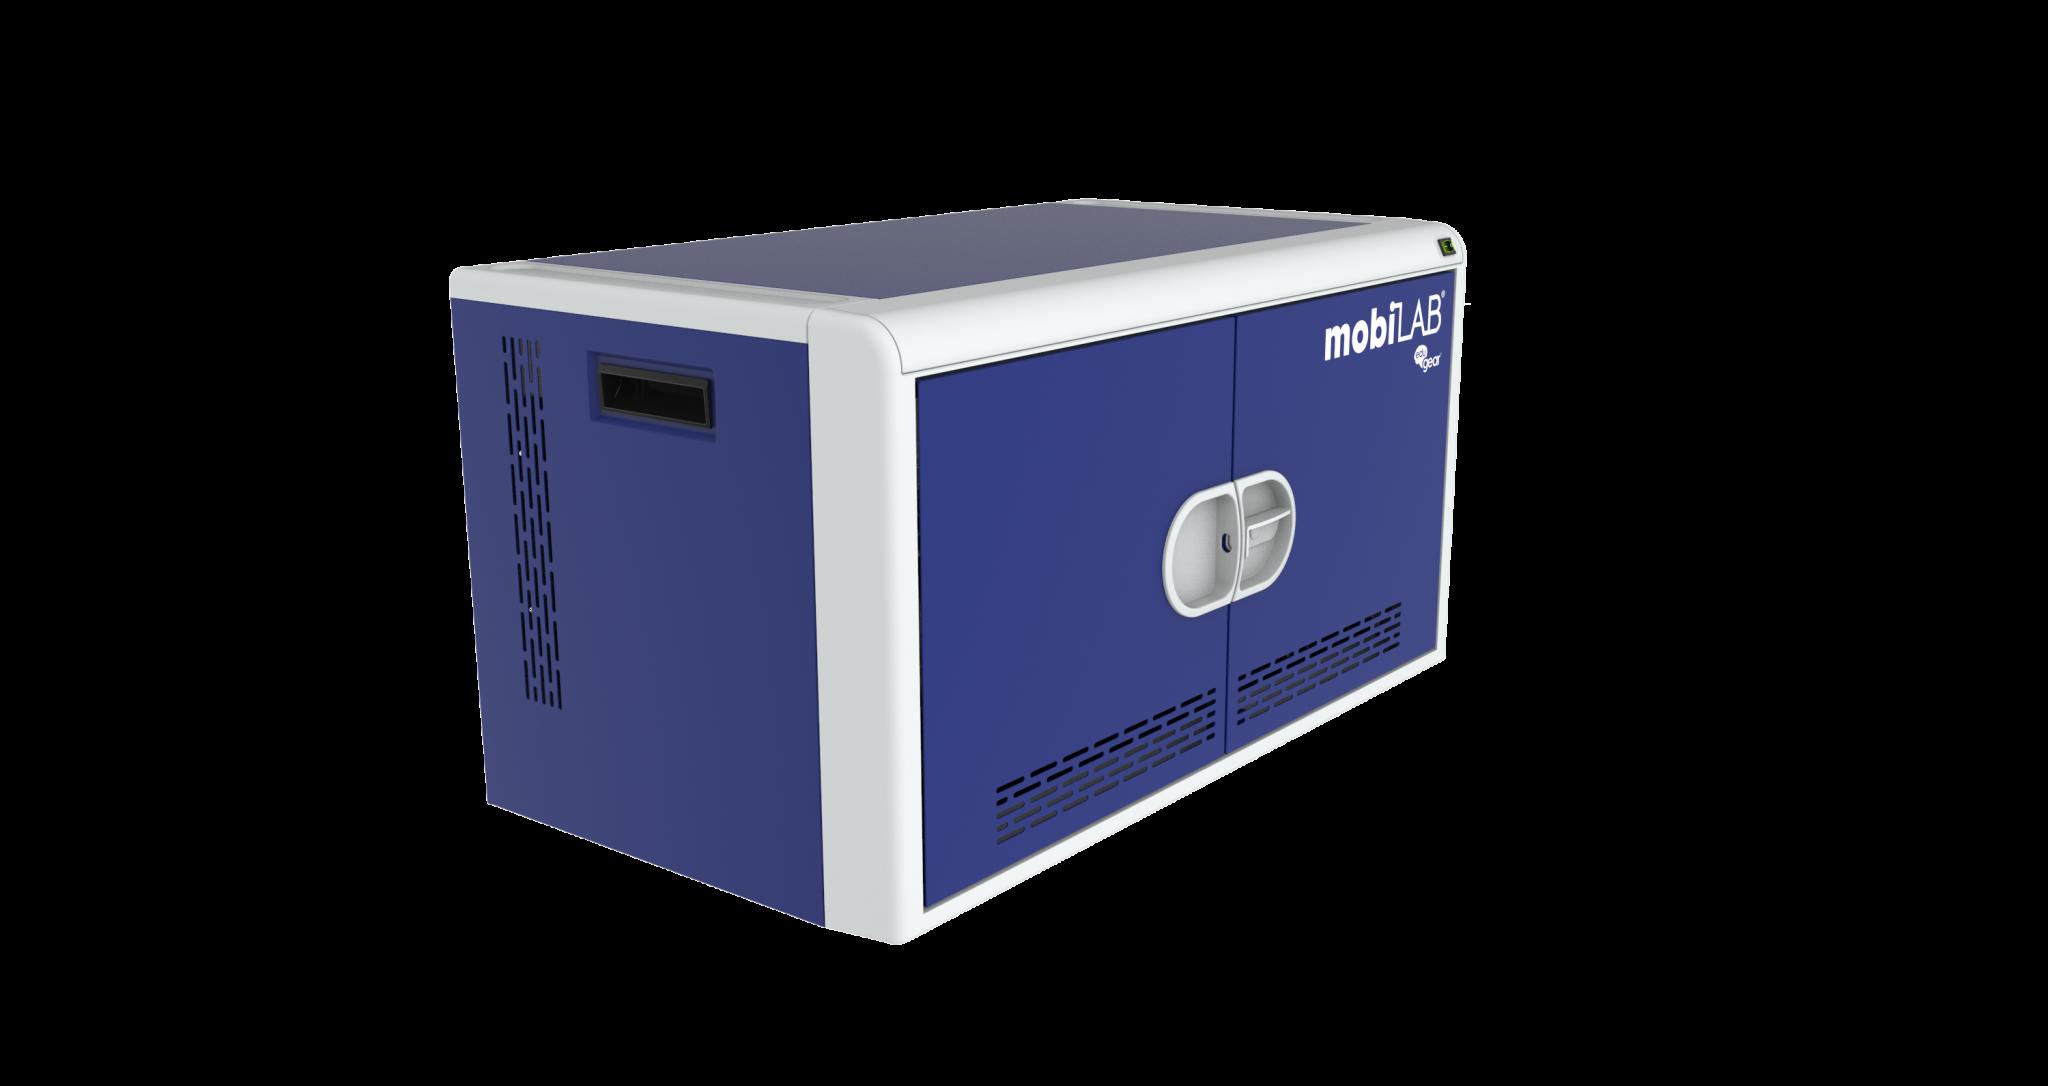 mobiLAB_ChargingCabinet_CC14_4 Mobile Charging & Storage